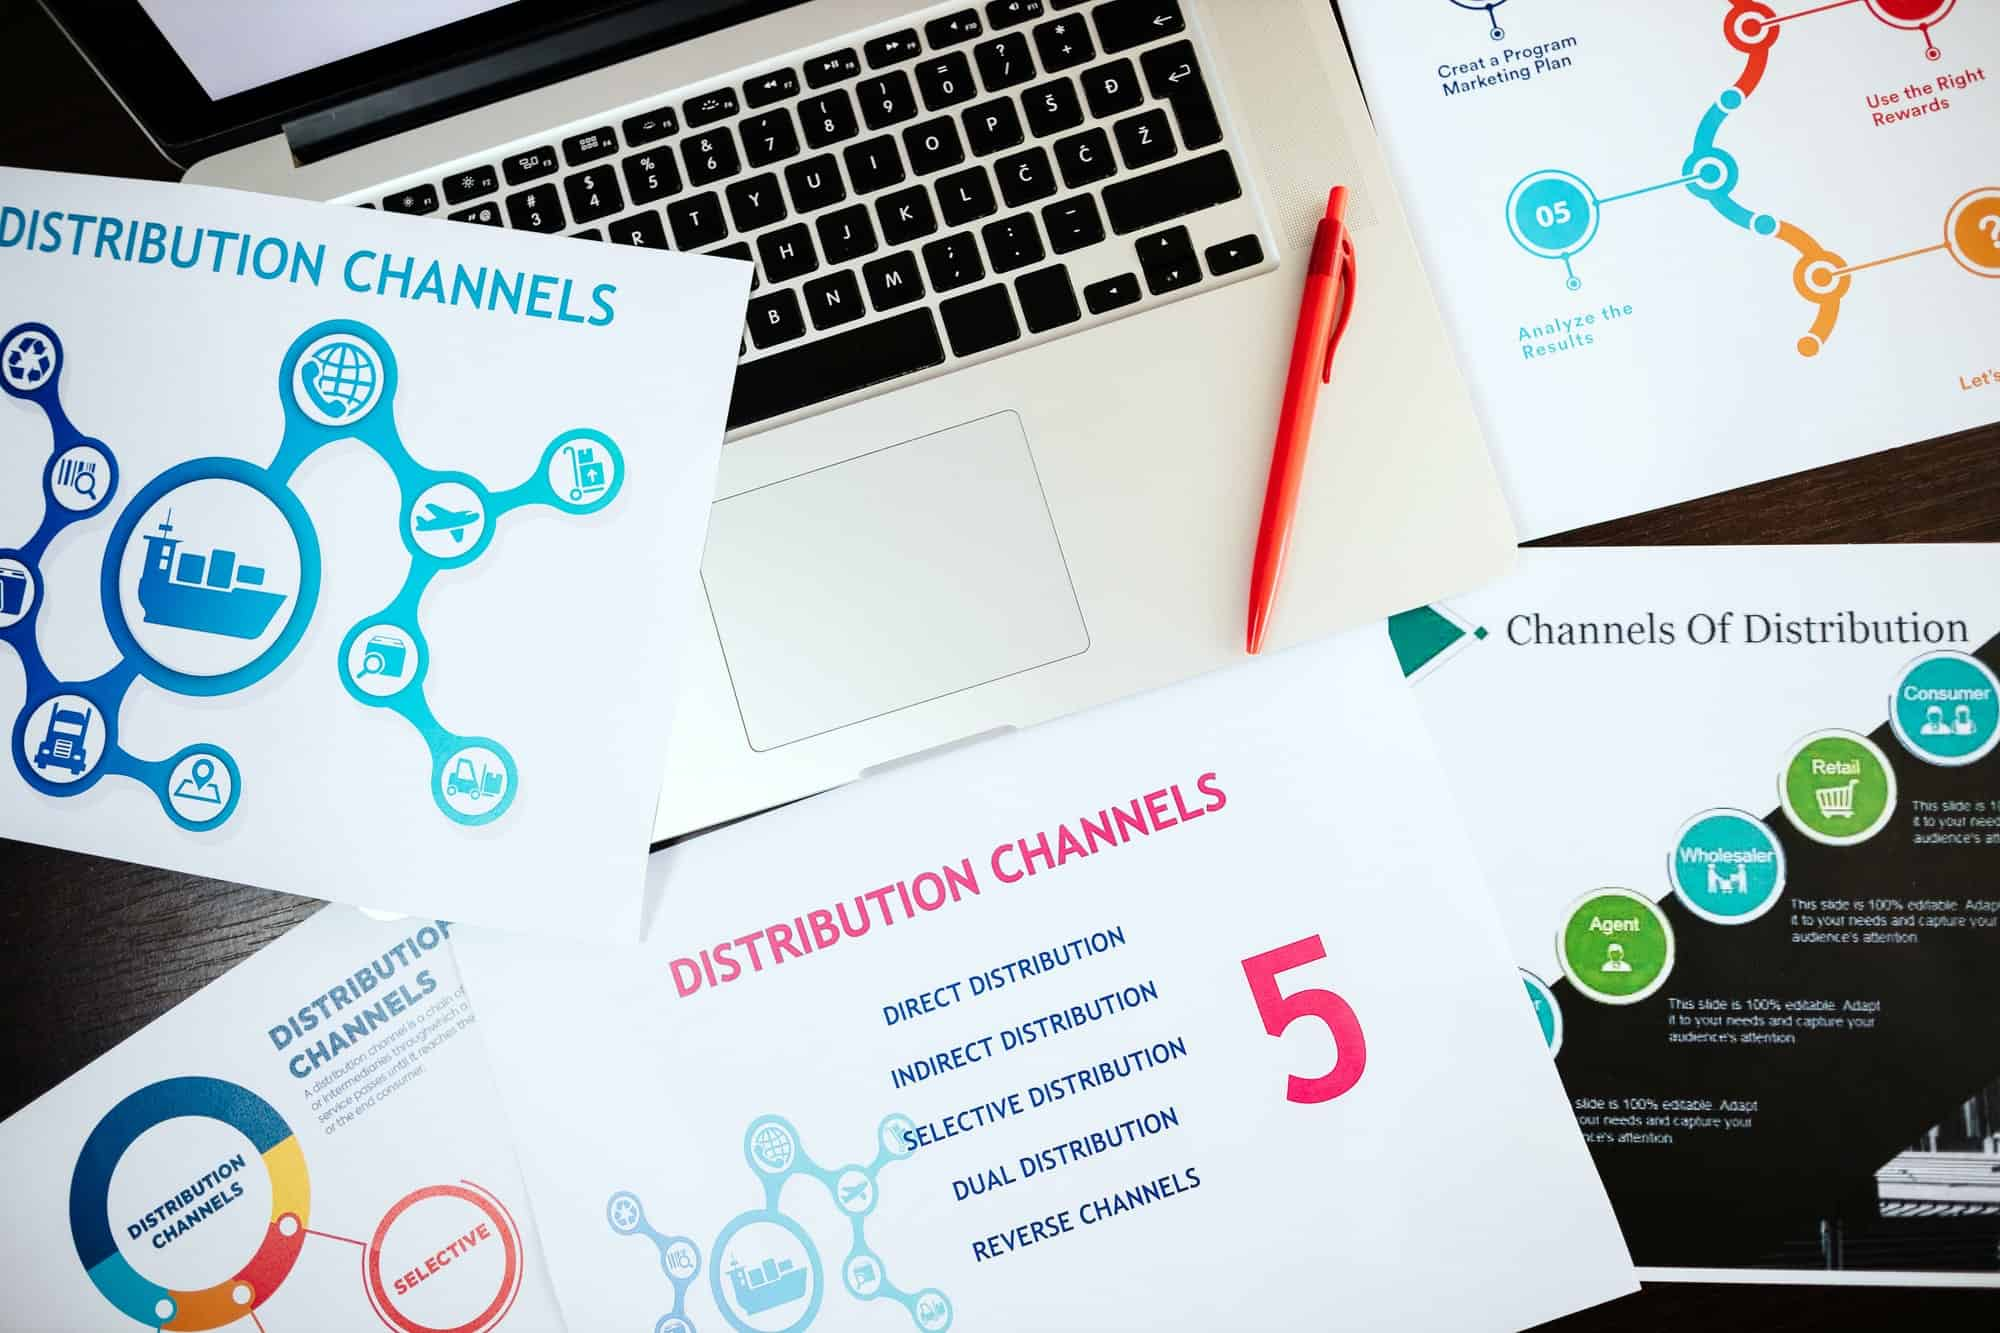 marketing distribution channels plan on office desk